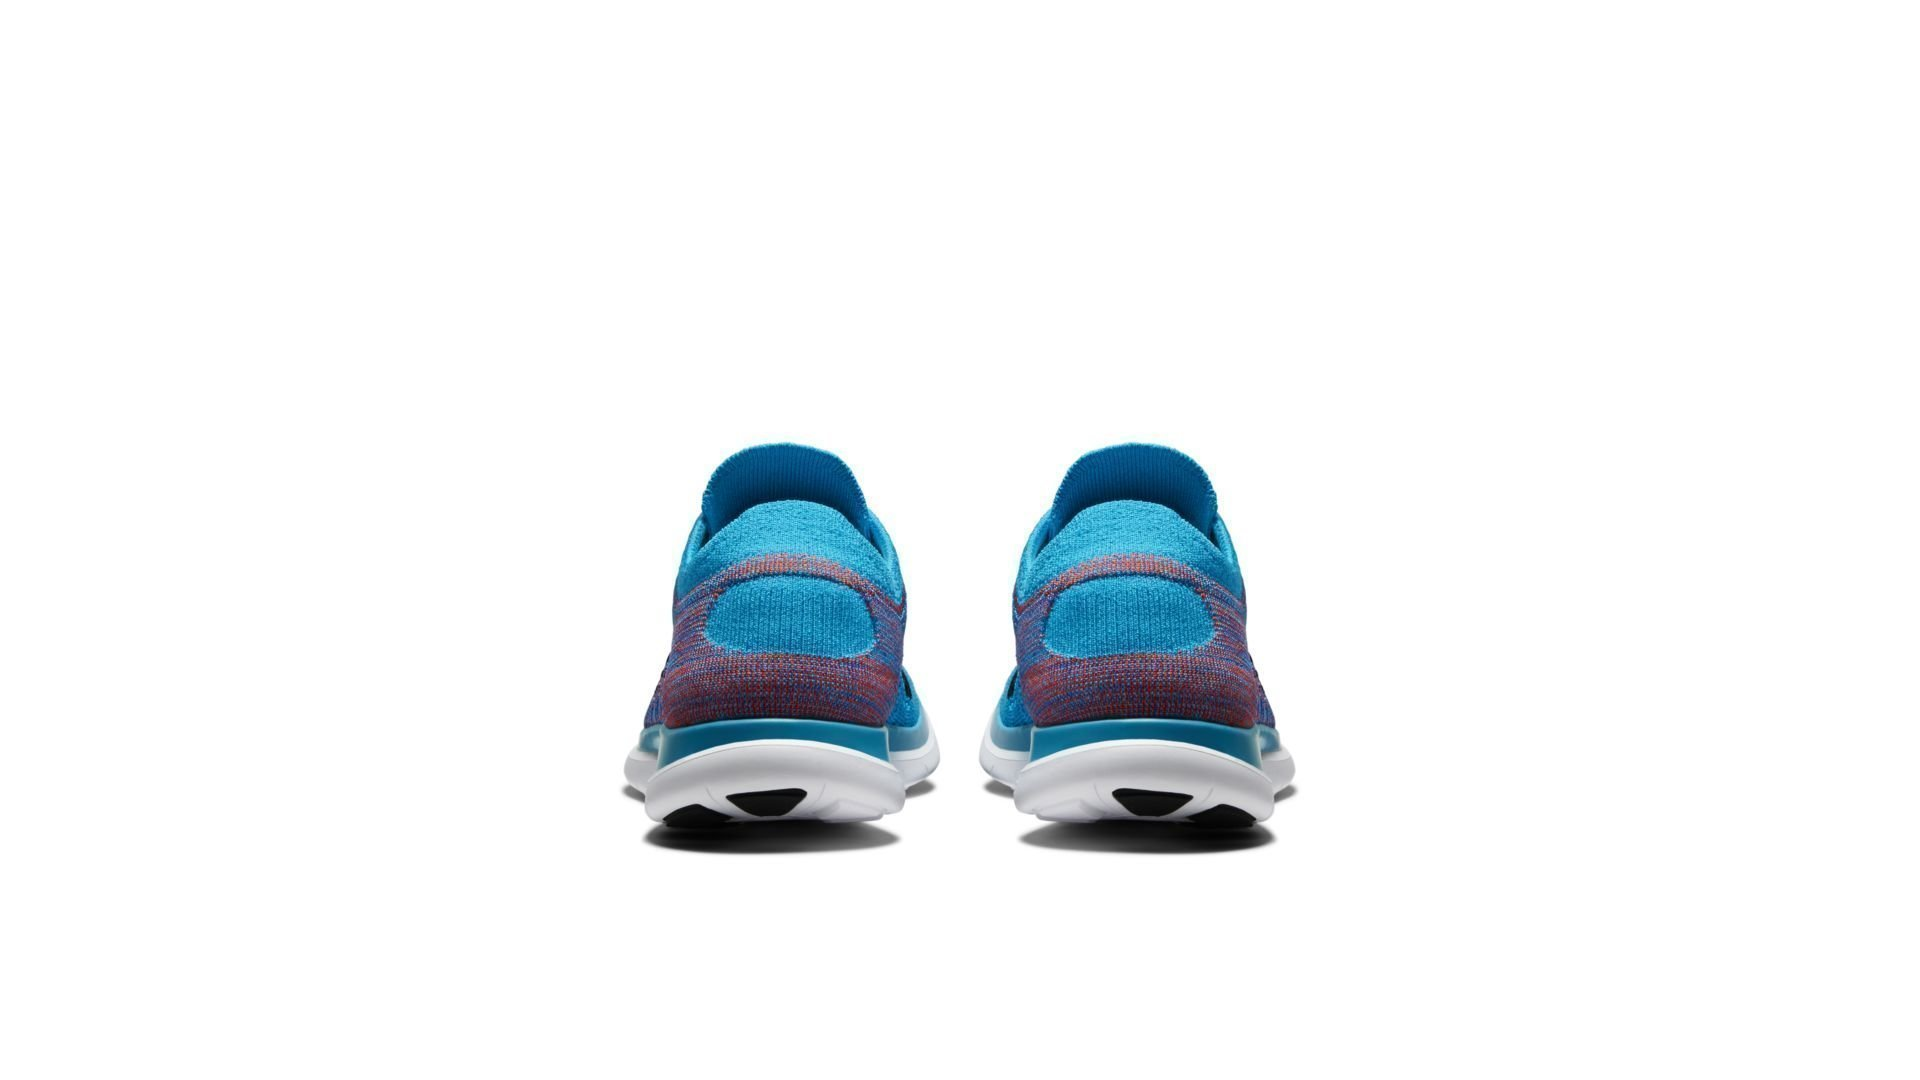 Nike Free 4.0 Flyknit Blue Lagoon Bright Crimson (631053 403)